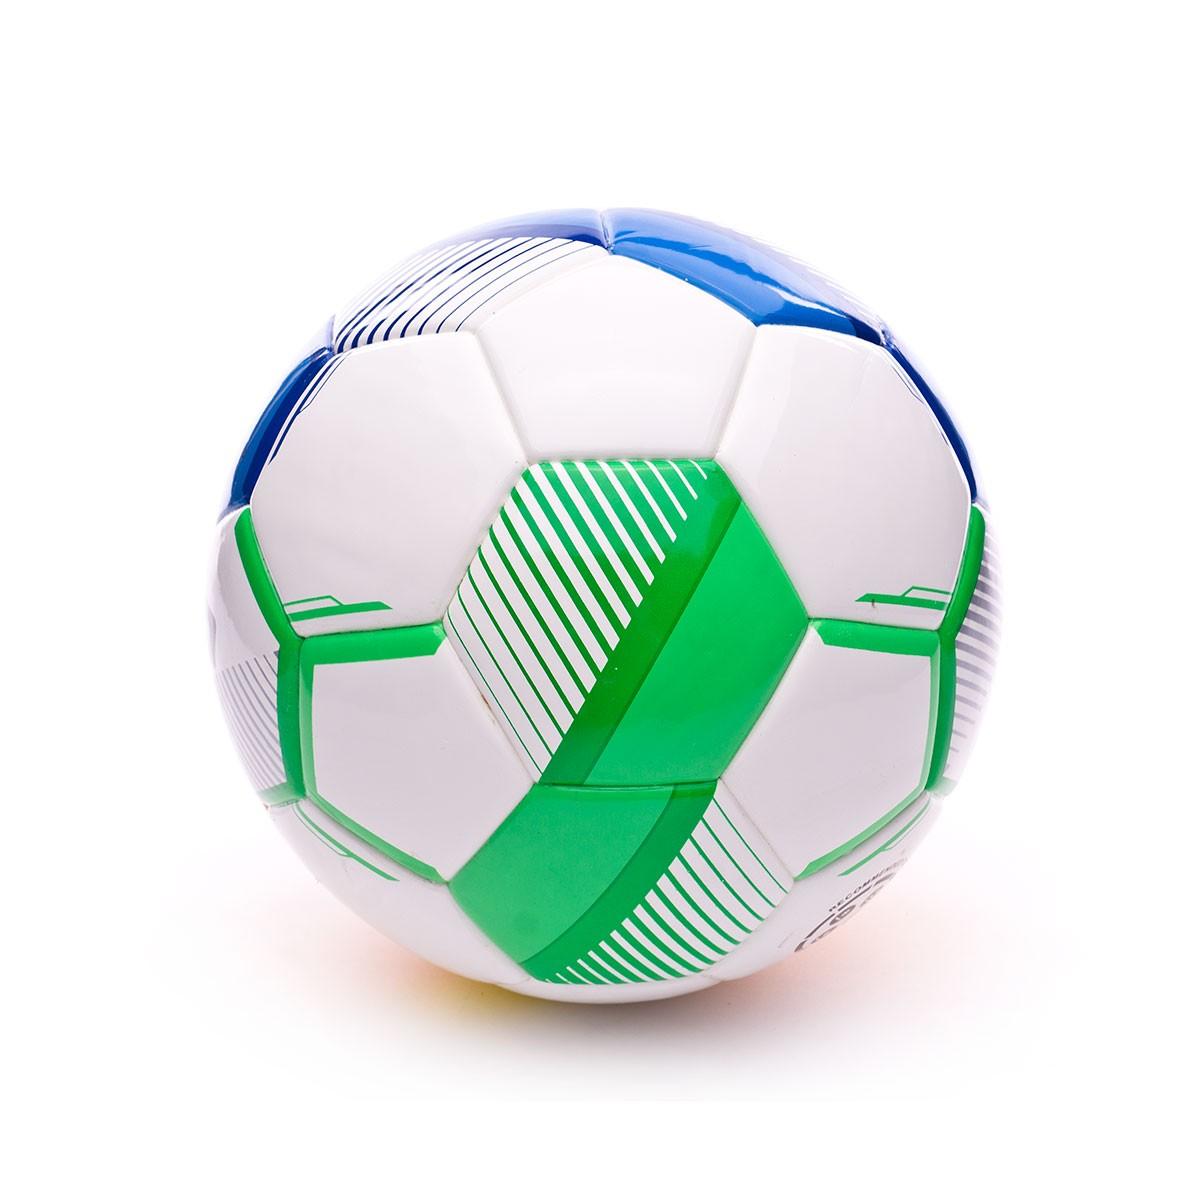 Baln Sp Axeler Futsal Ii Blanco Multicolor Soloporteros Es Ahora Balon Ftbol Emotion